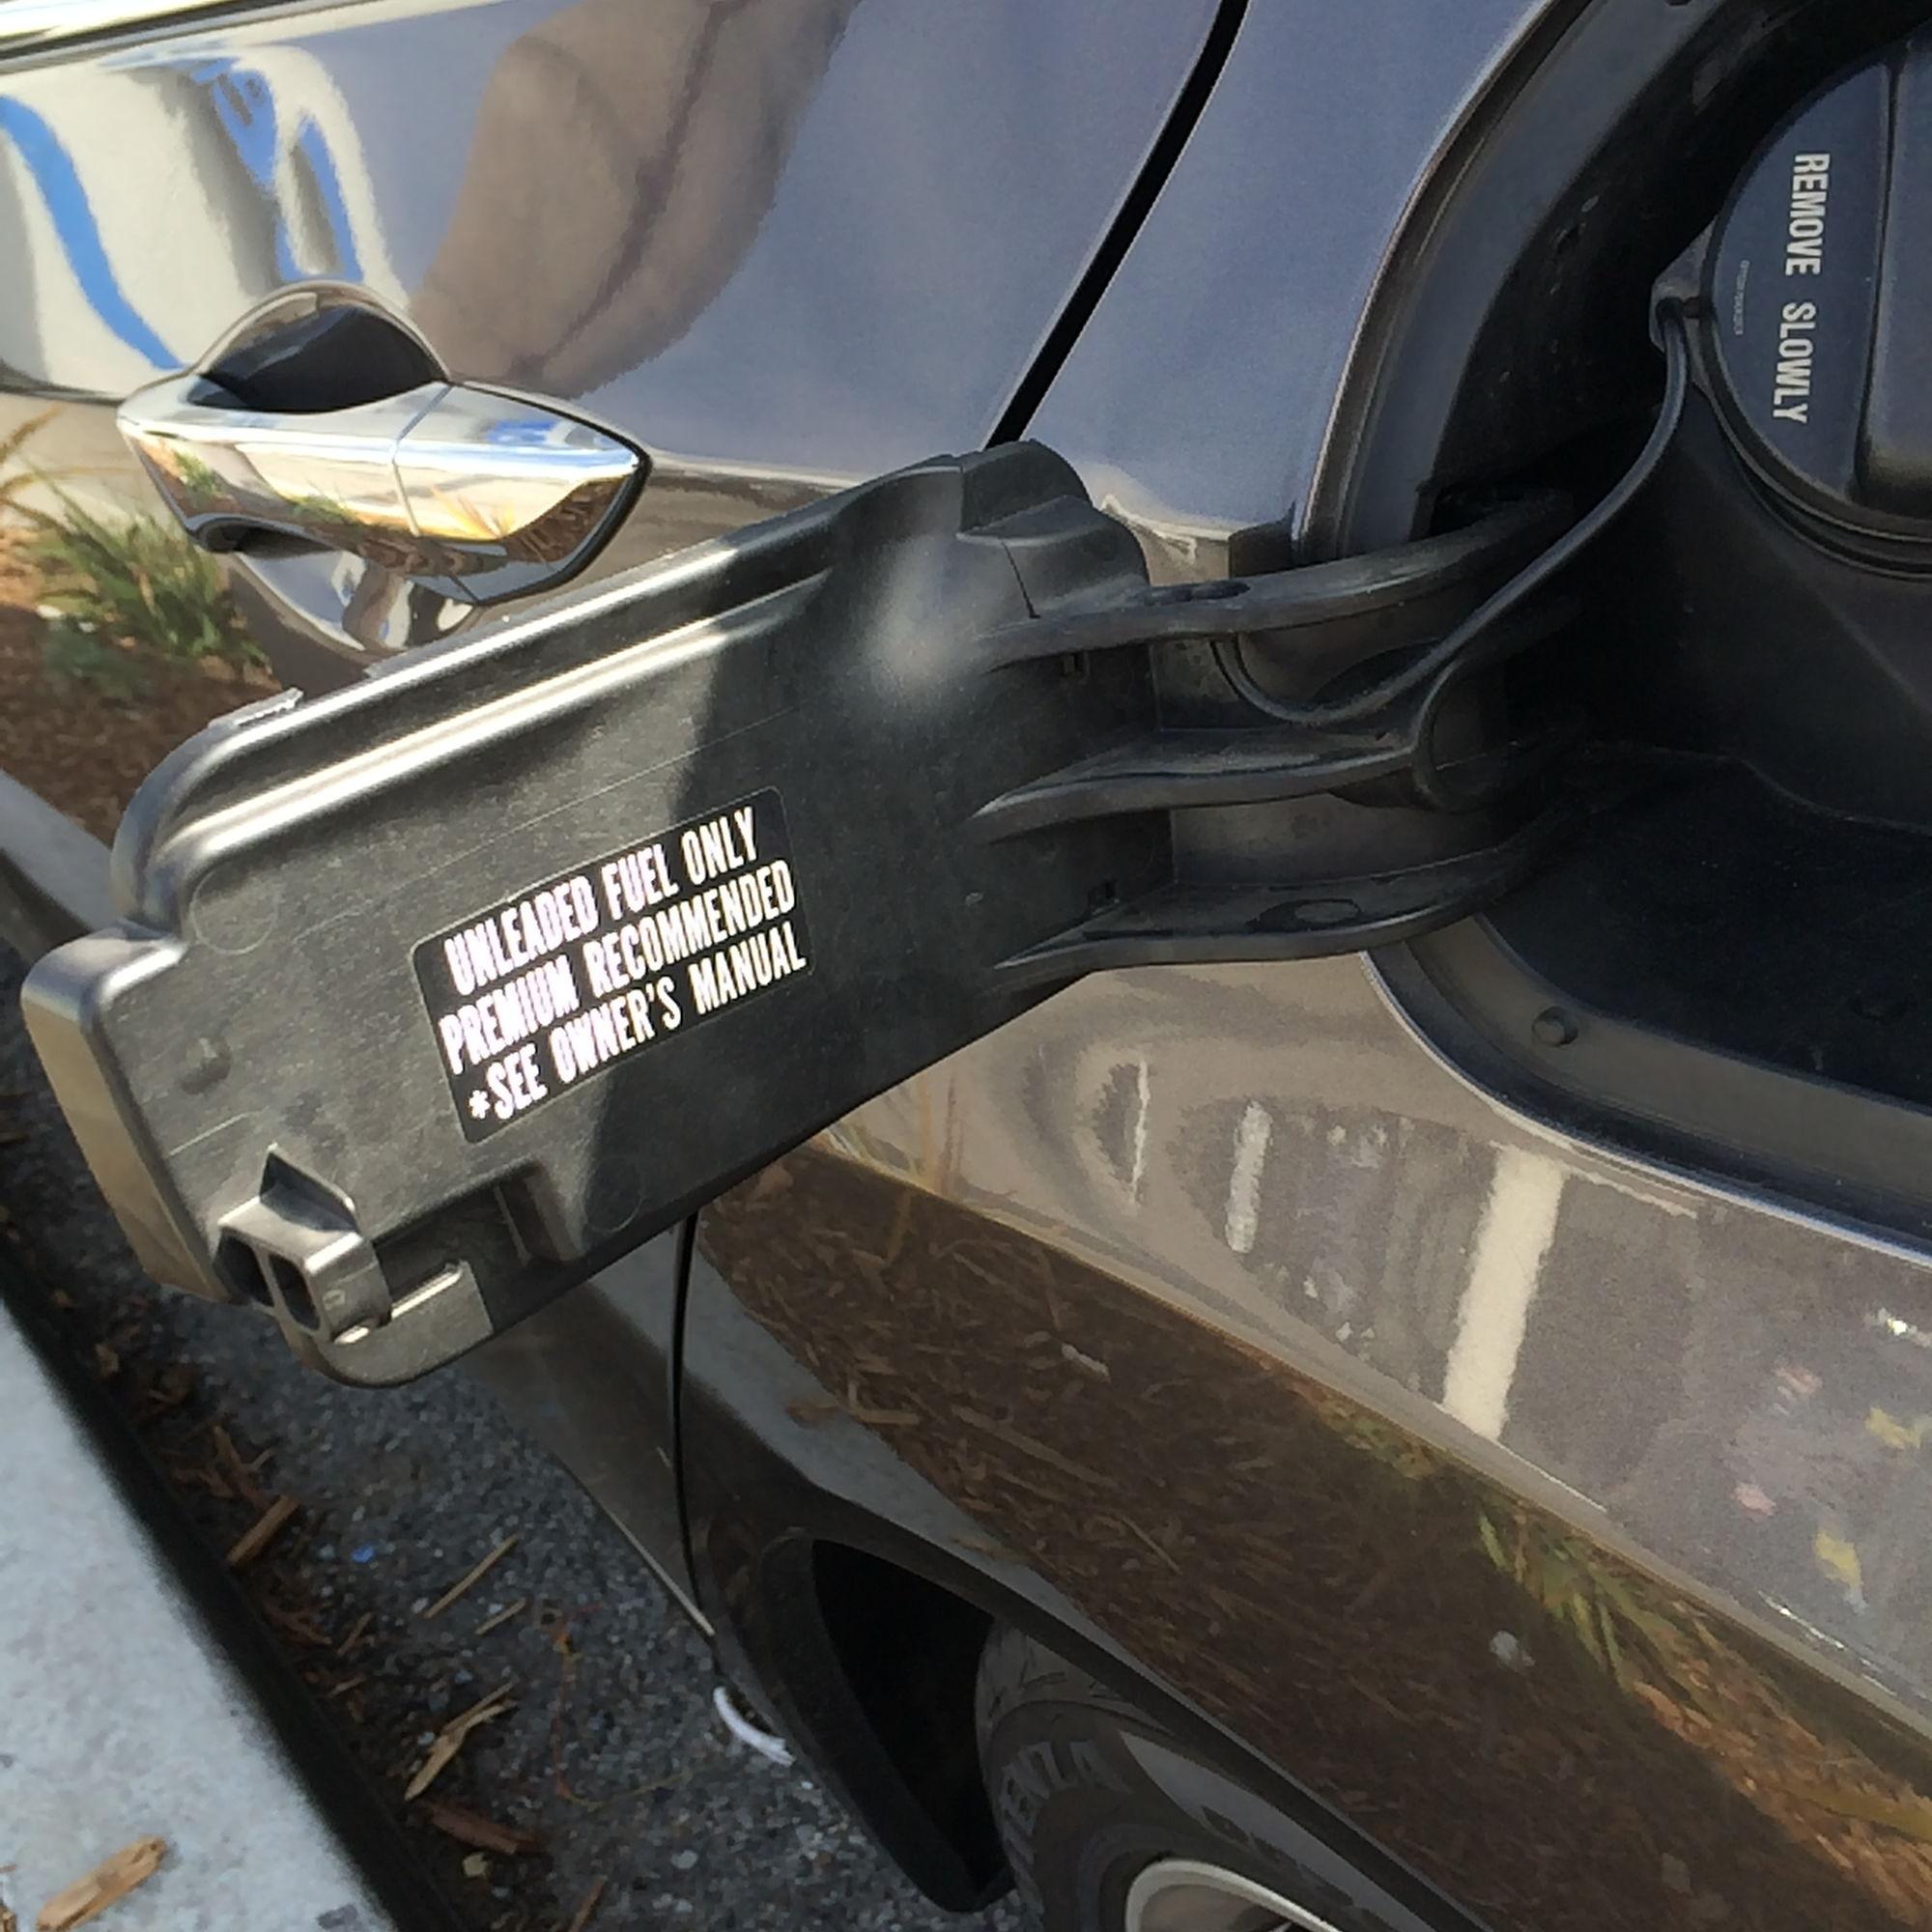 2009 tsx gas tank door arm replacement acurazine acura rh acurazine com Acura TL Grill Acura TL Rims